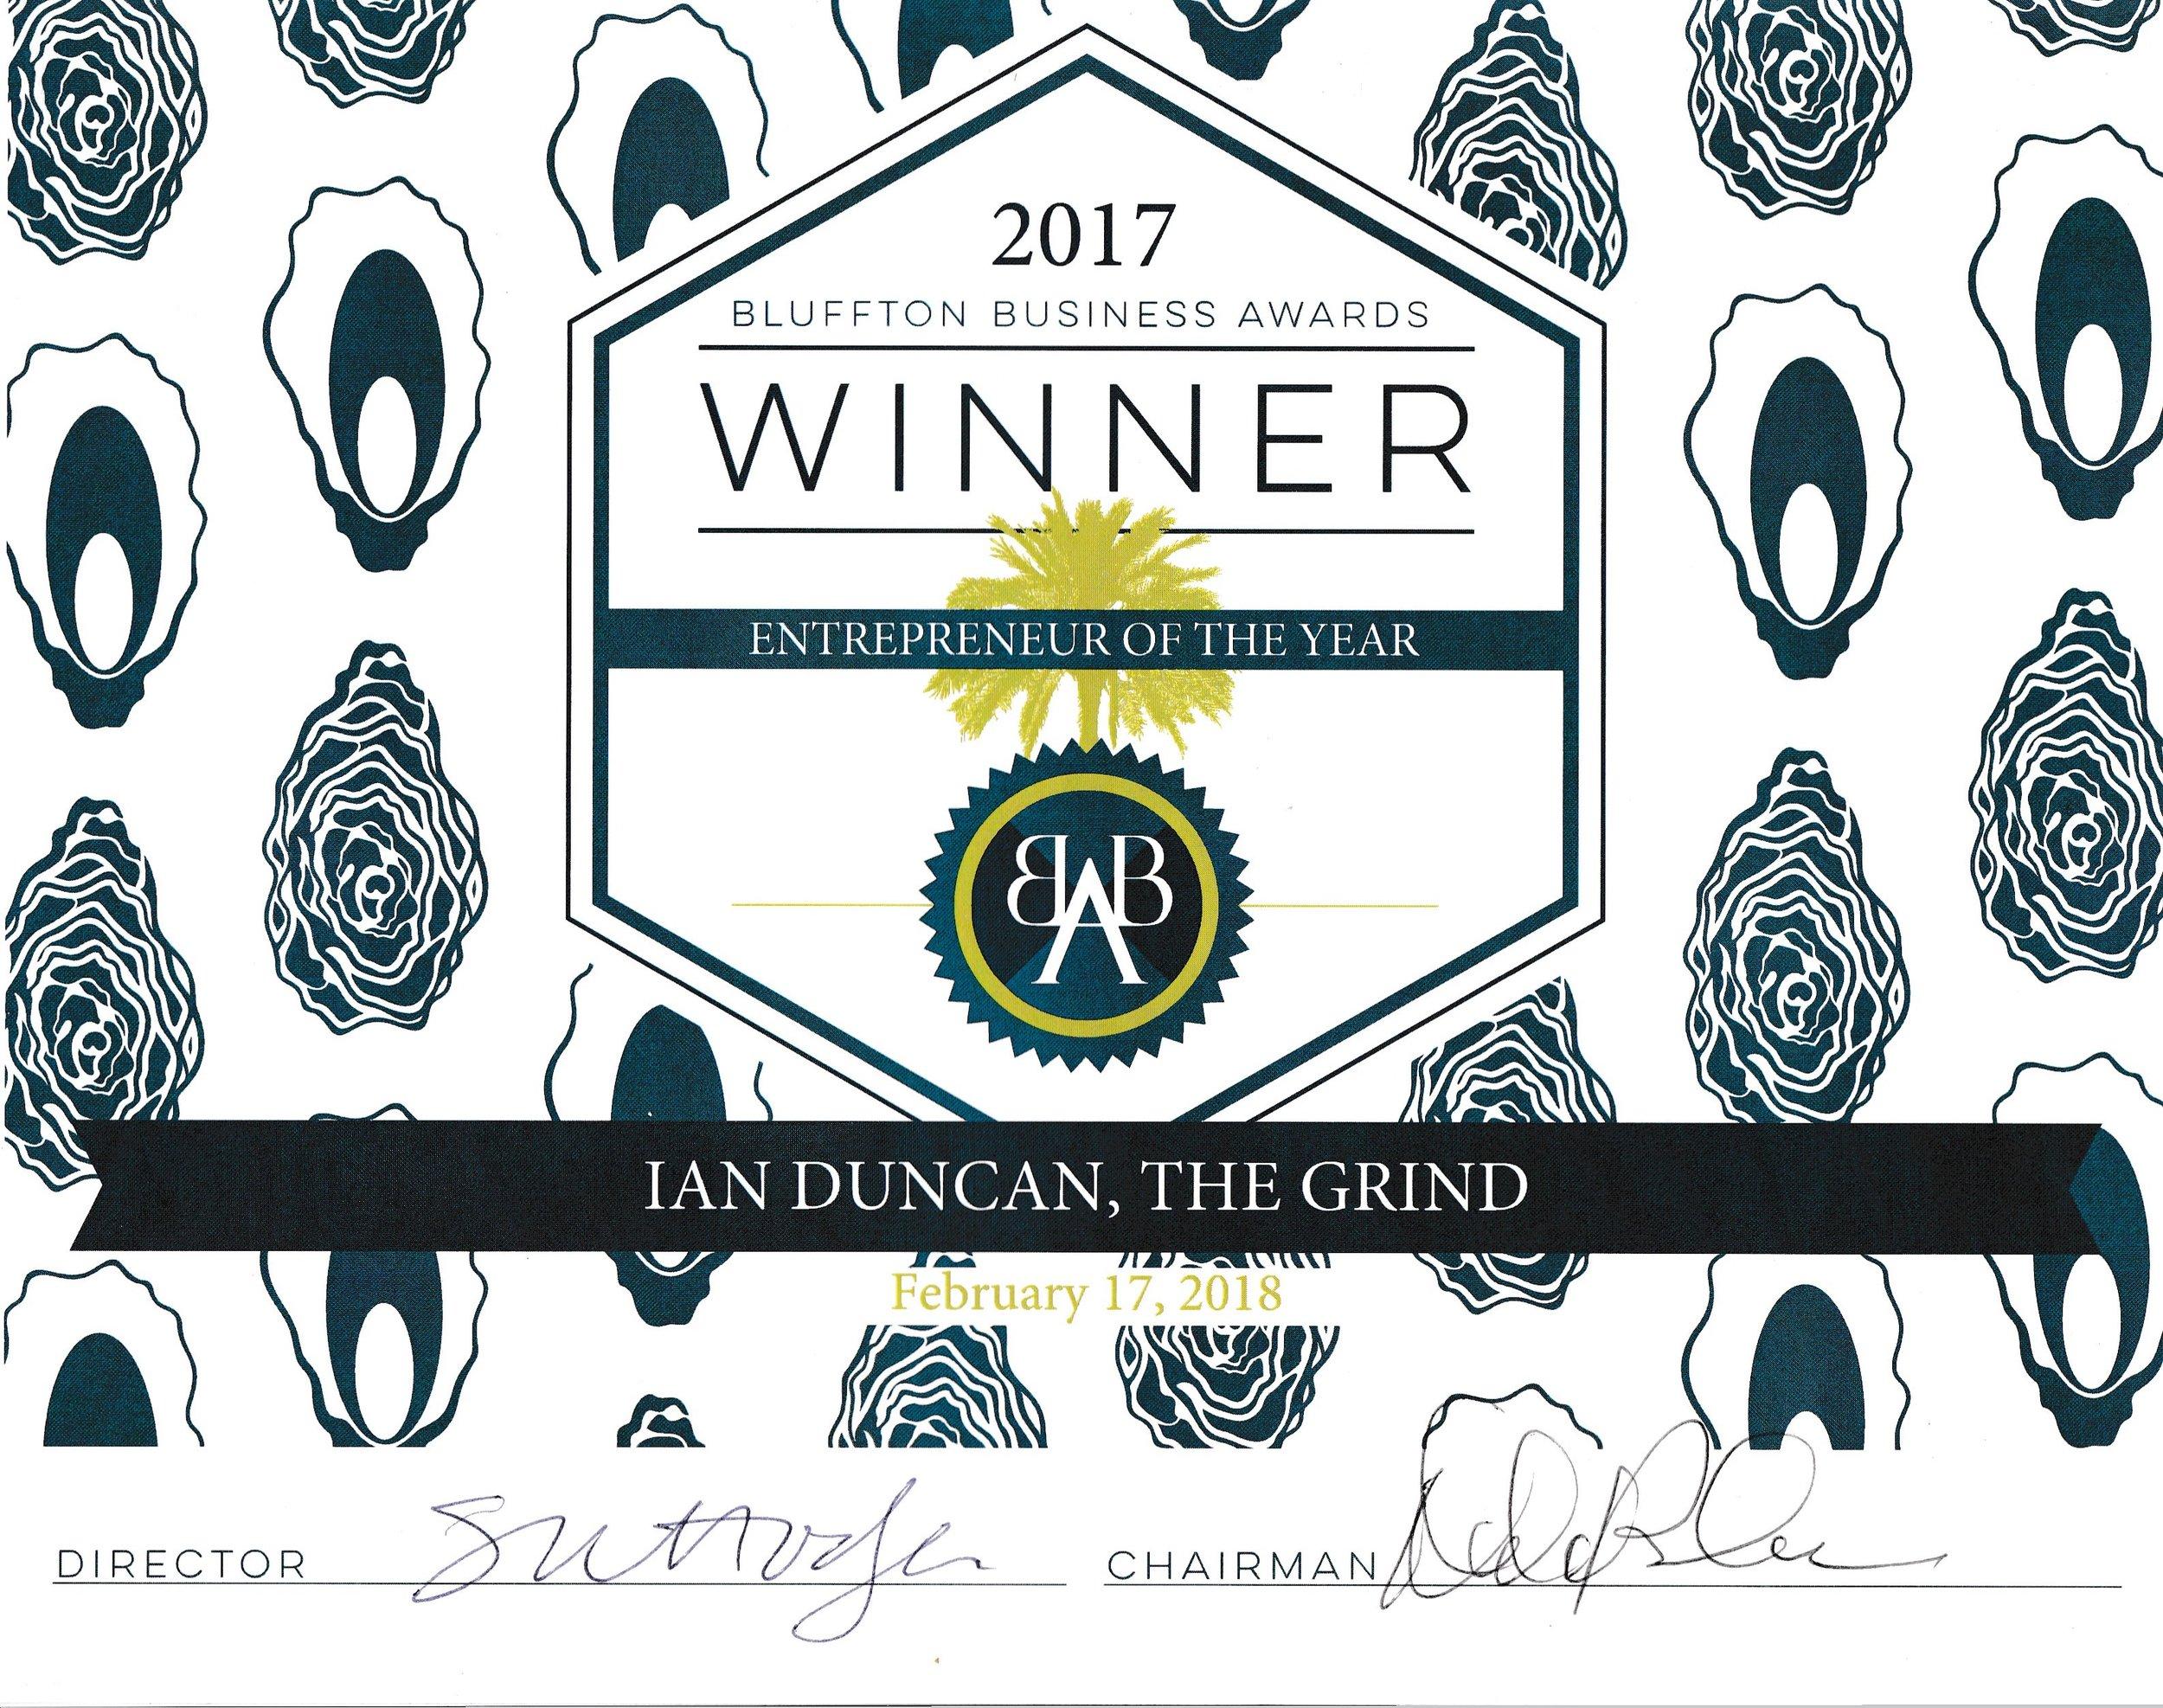 Entrepreneur-of-the-Year-award-2017.jpg